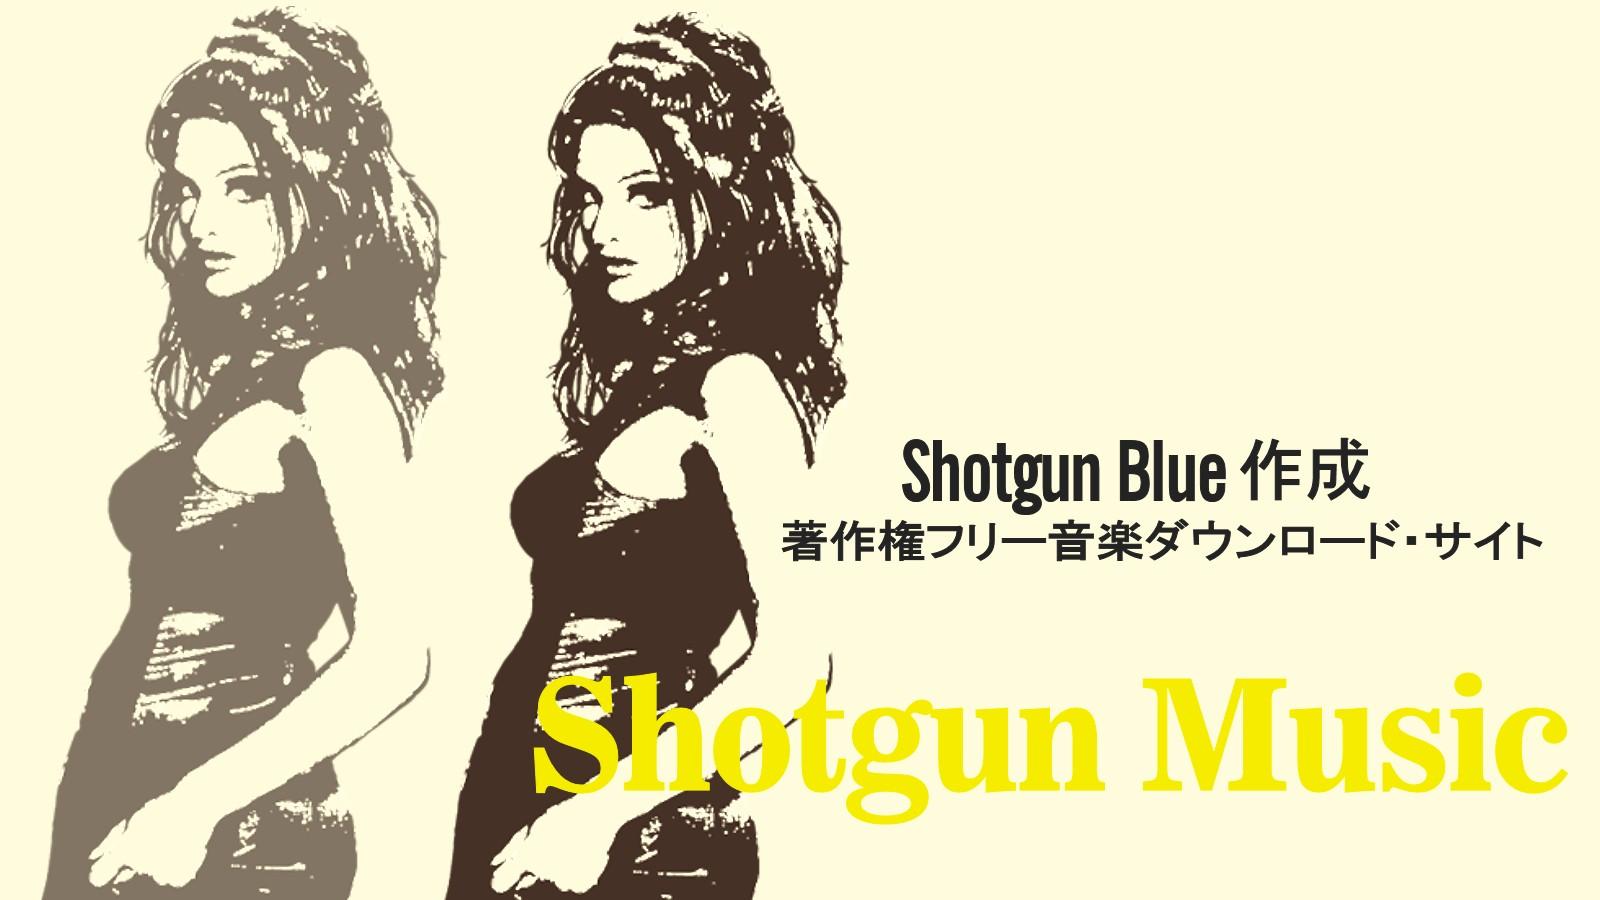 SHOTGUN MUSIC